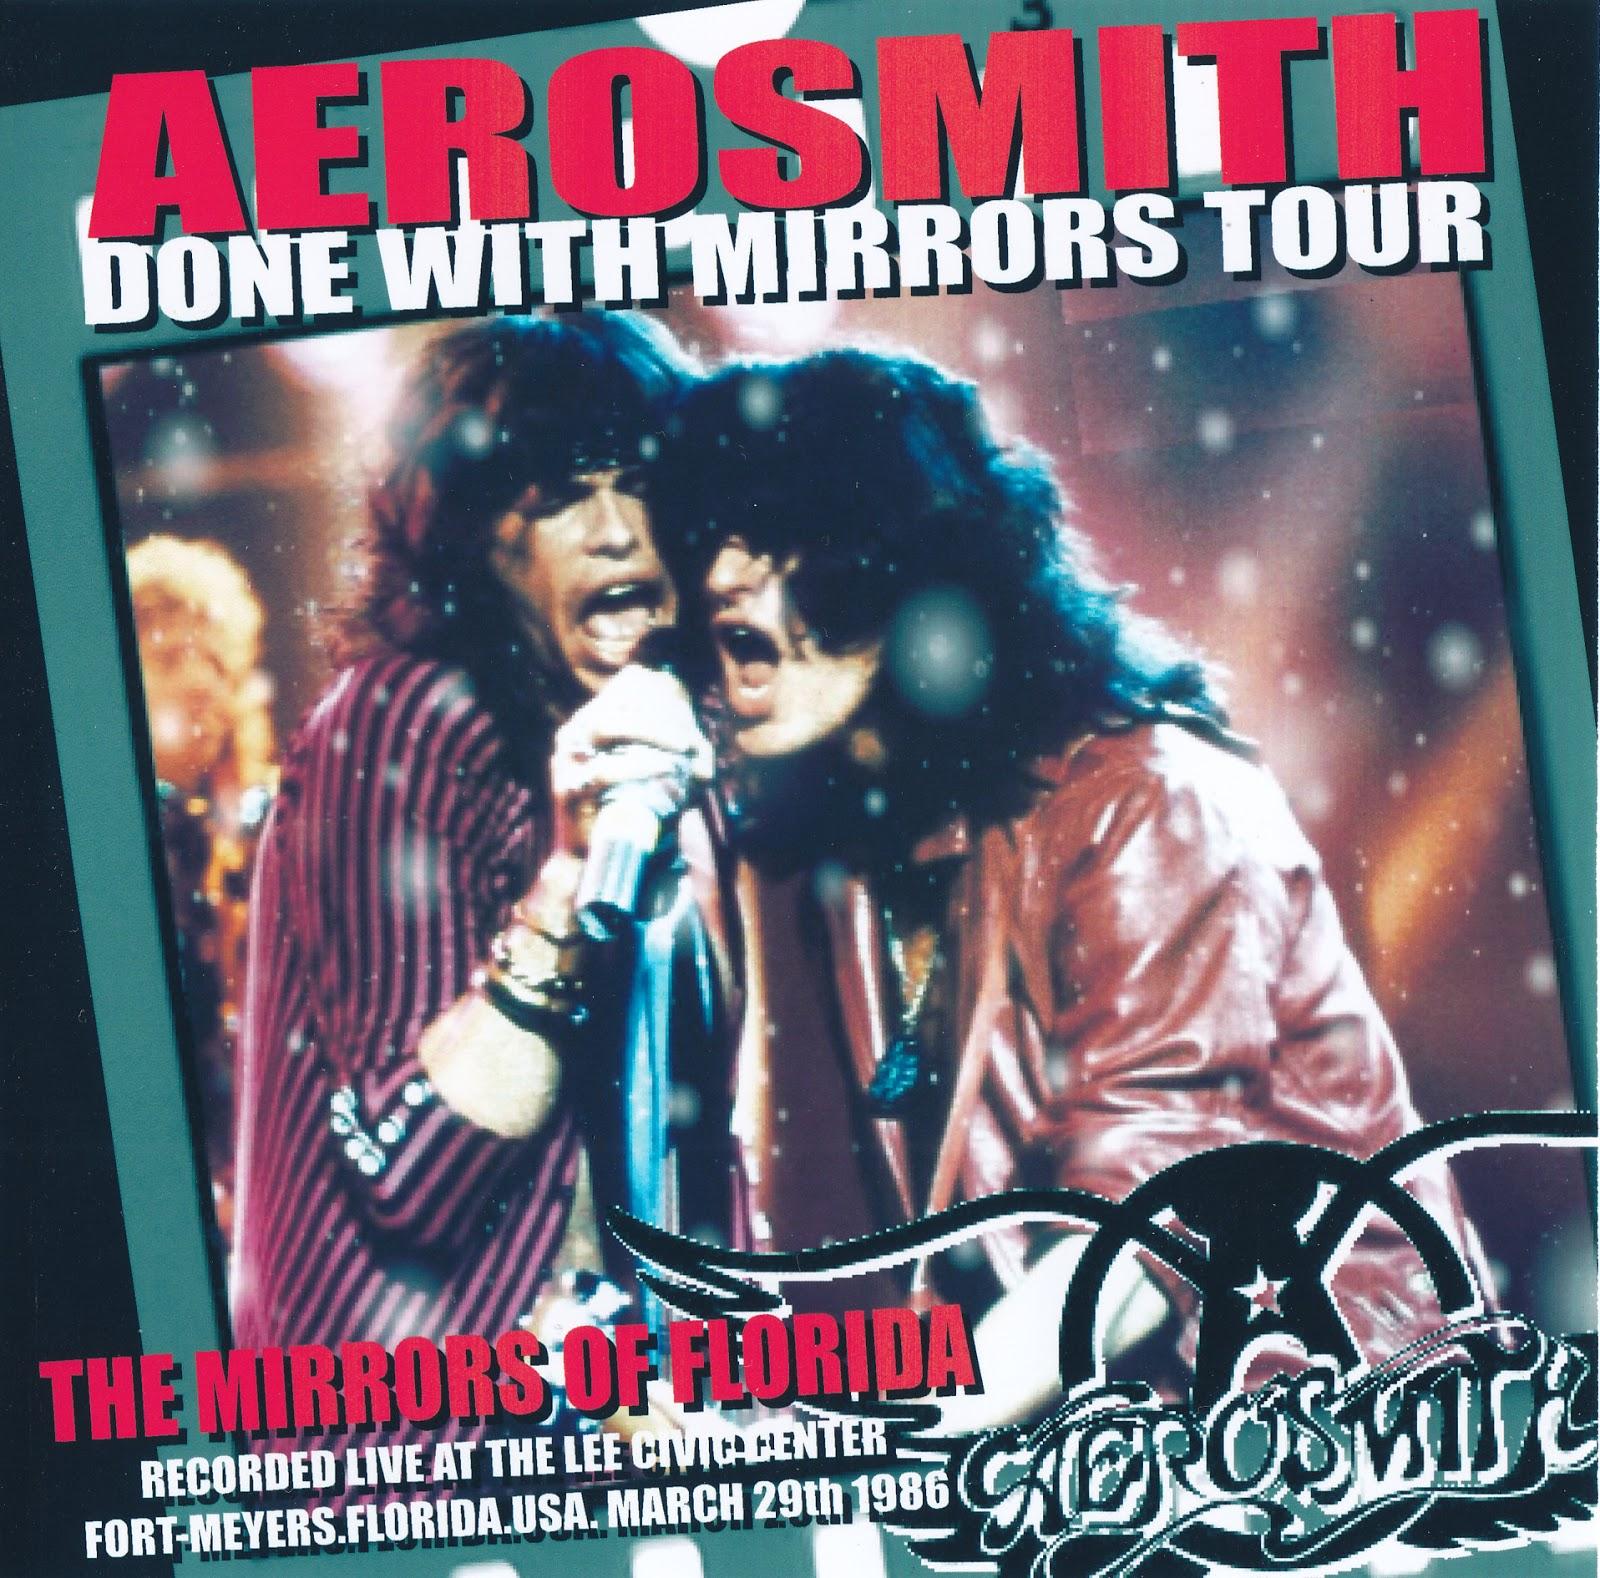 Aerosmith Bootlegs Cover Arts The Mirrors Of Florida